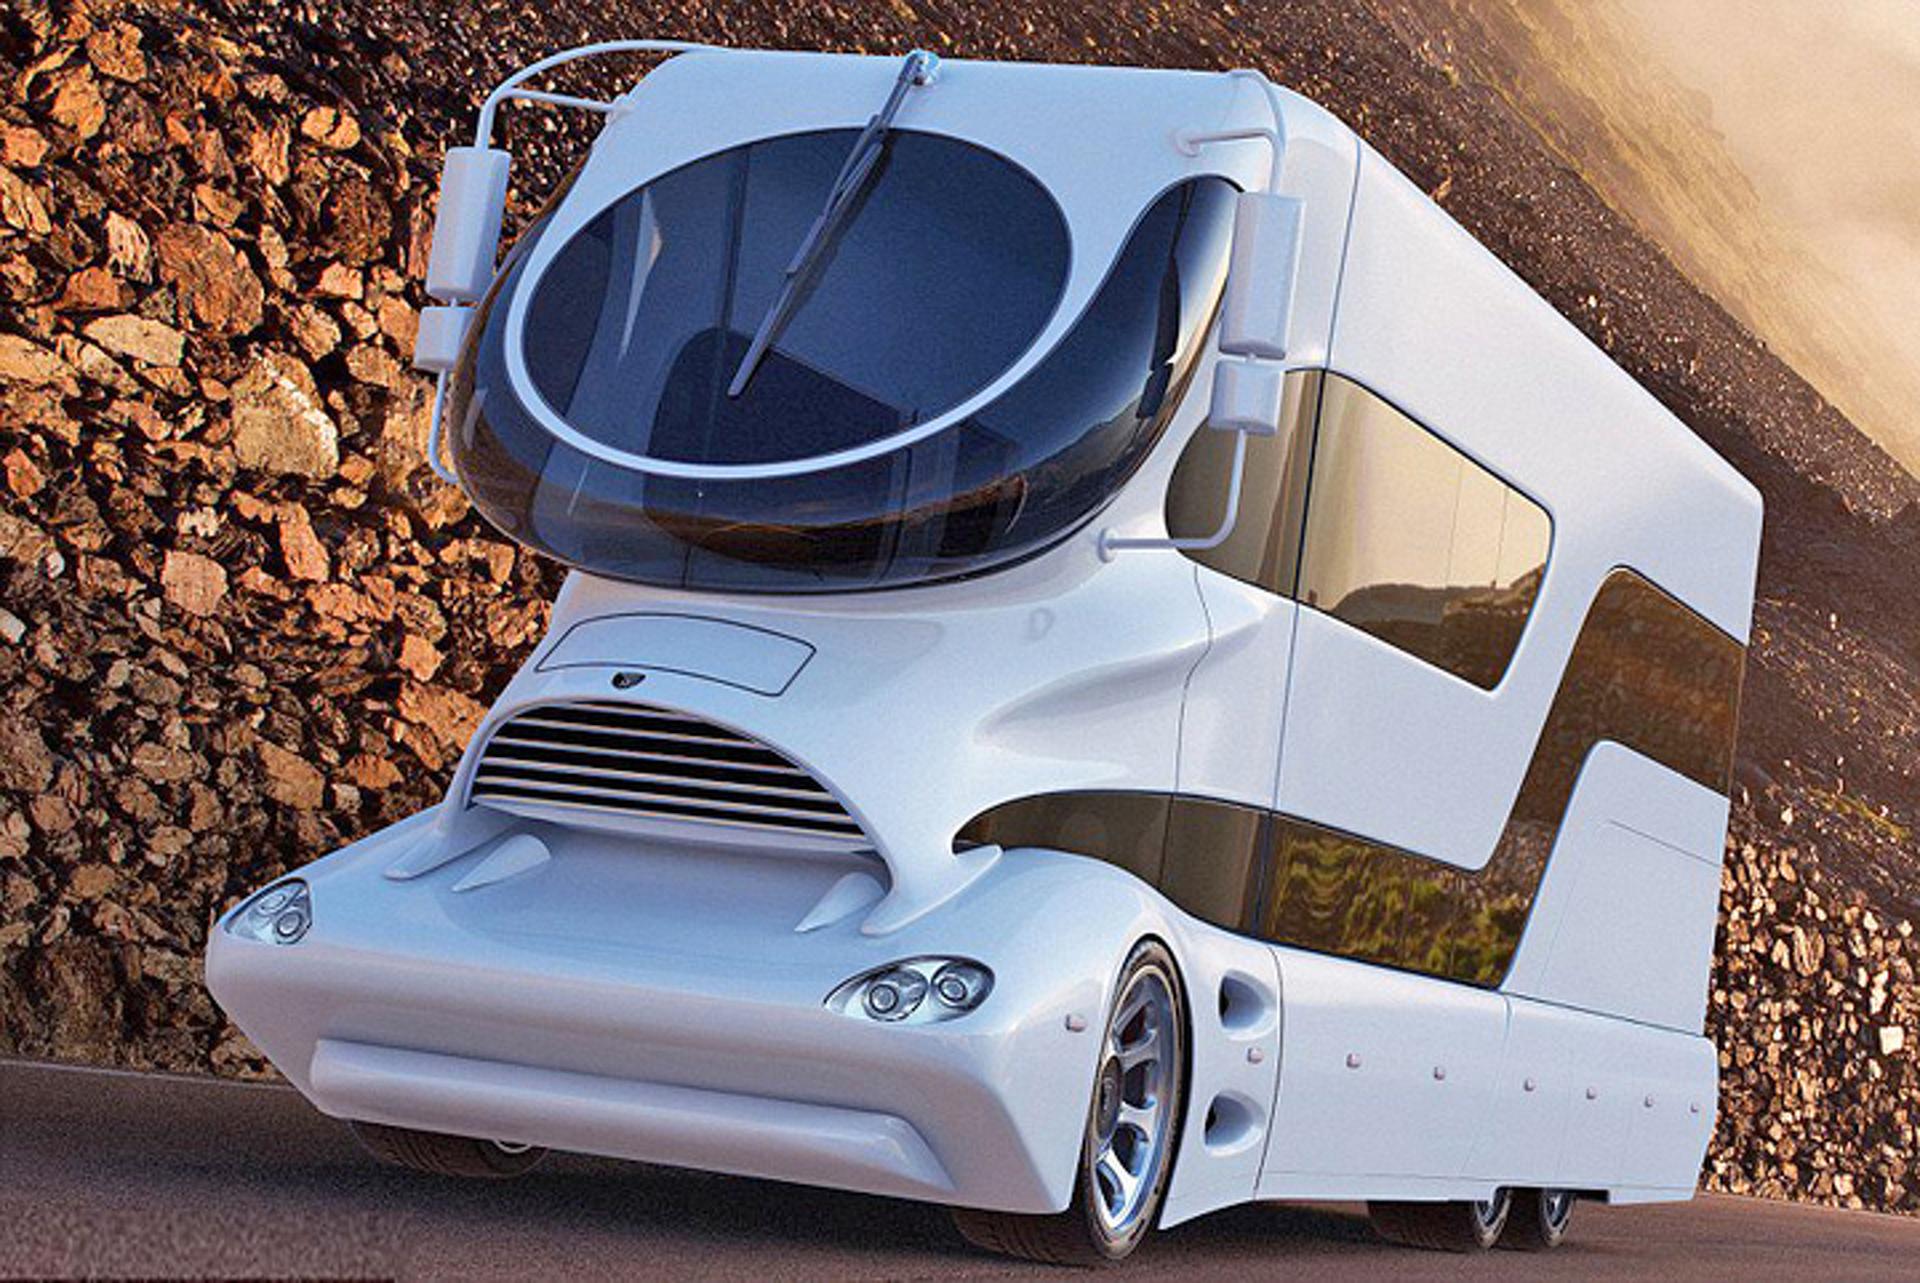 World s Most Expensive RV Sold in Dubai w Video